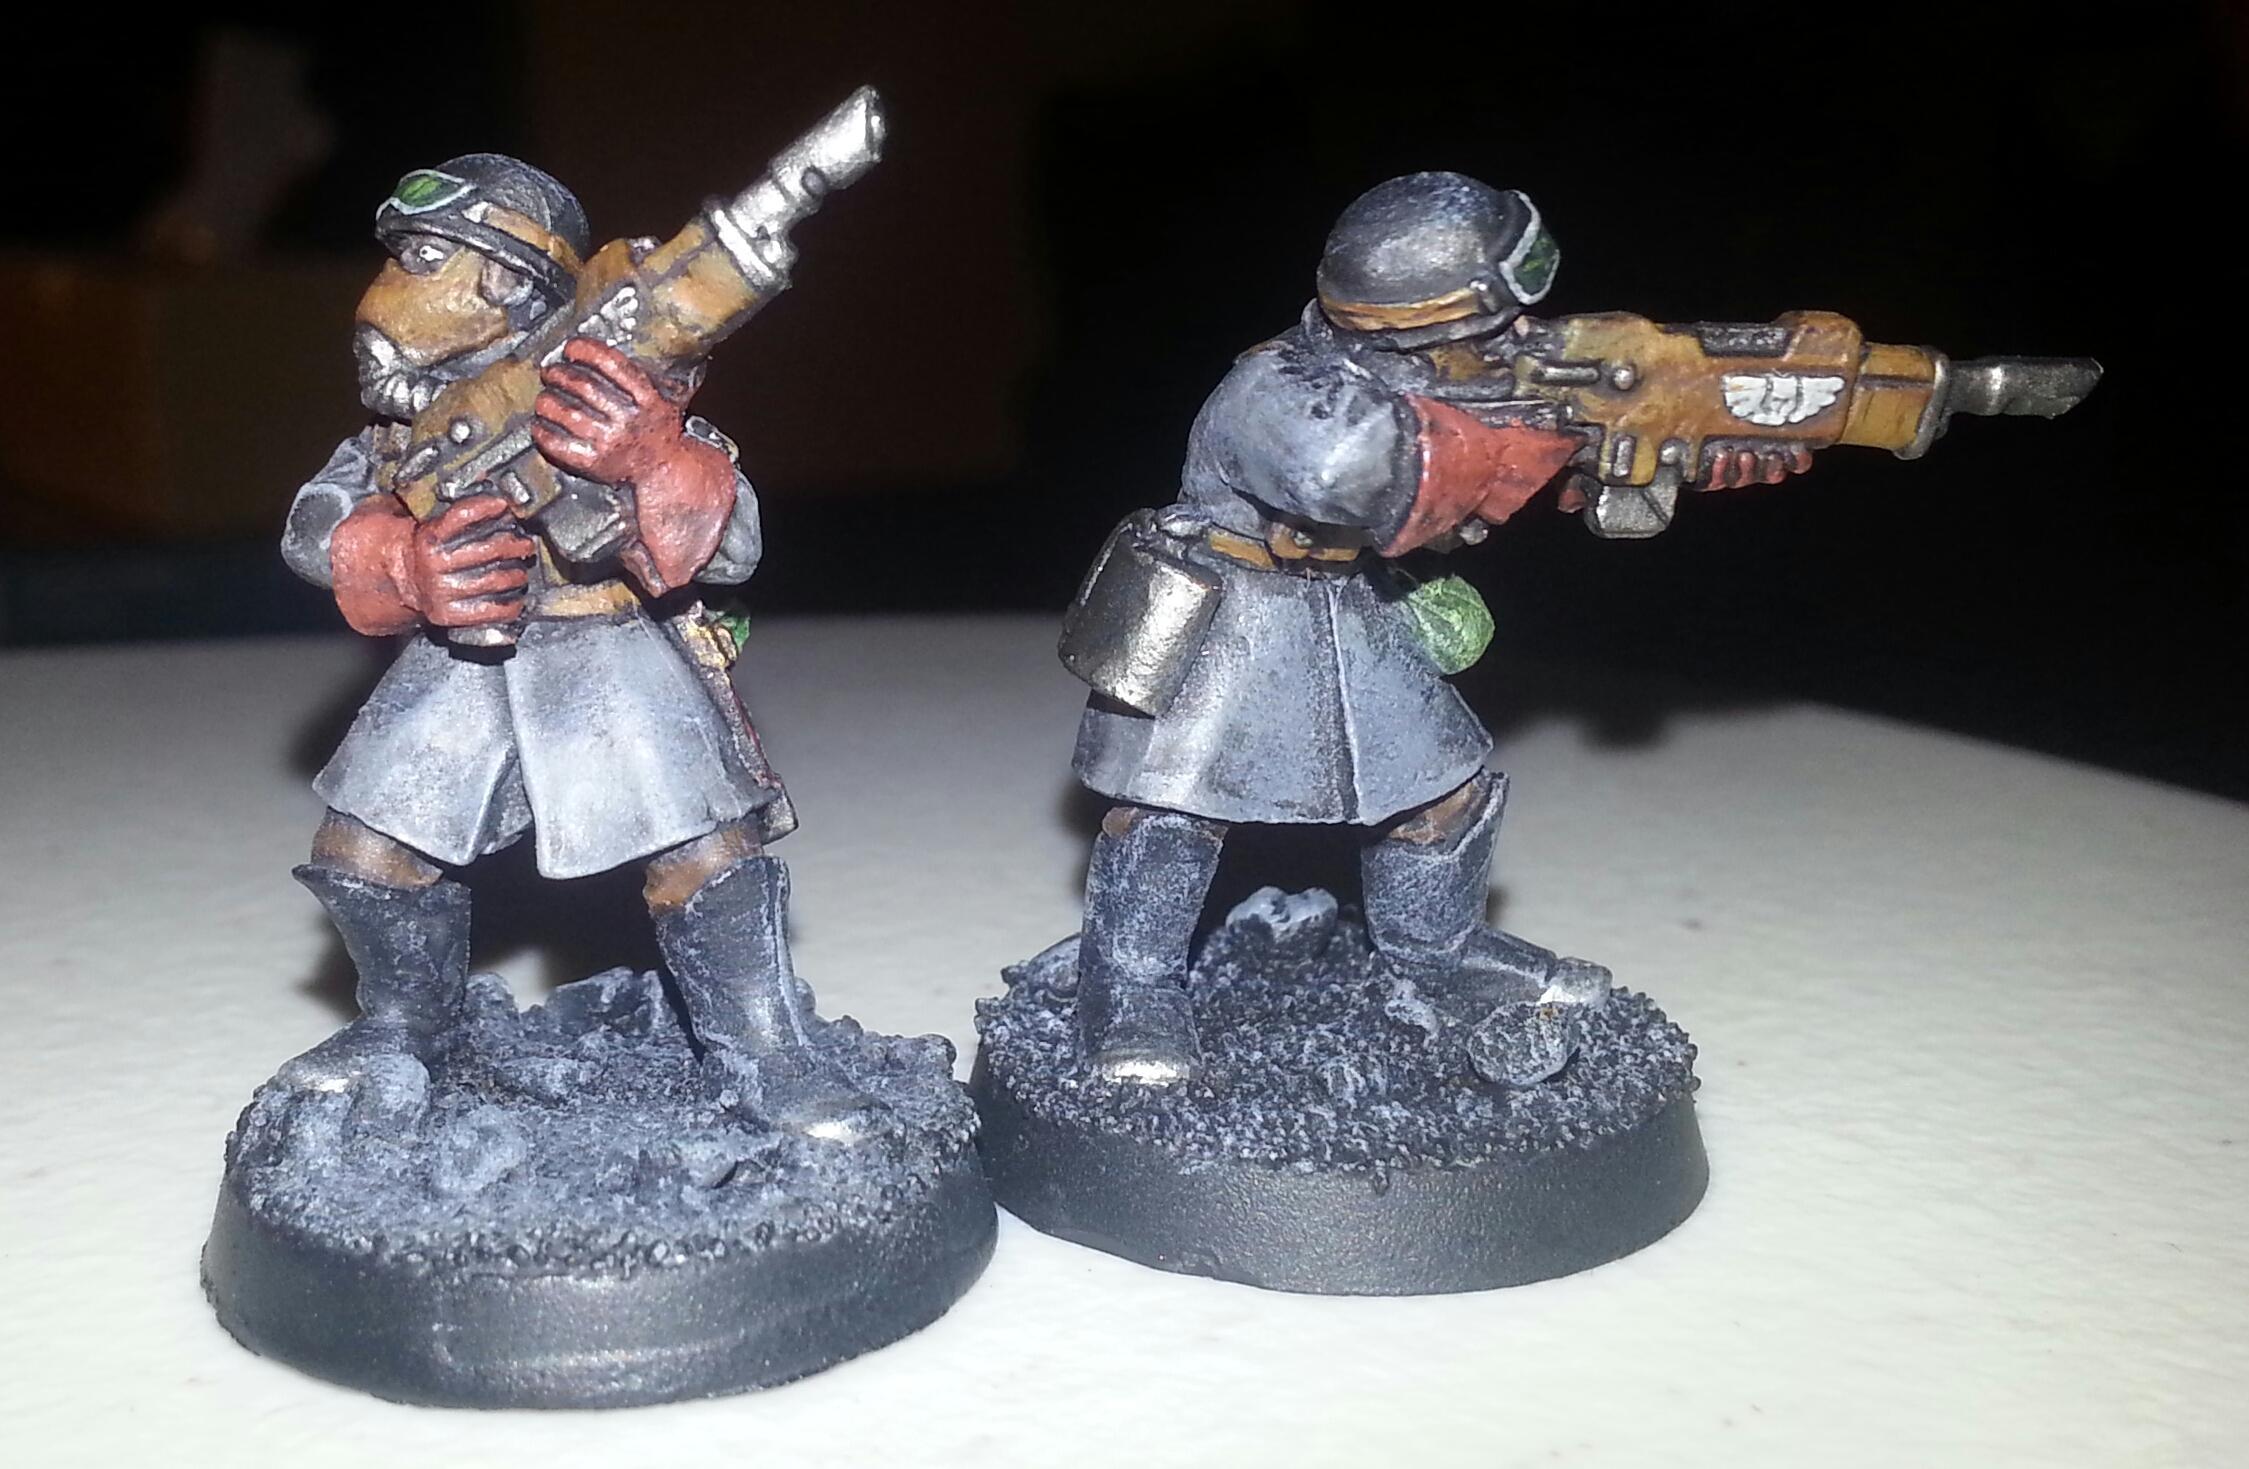 Brown, Grey, Imperial Guard, Lasgun, Steel Legion, Warhammer 40,000